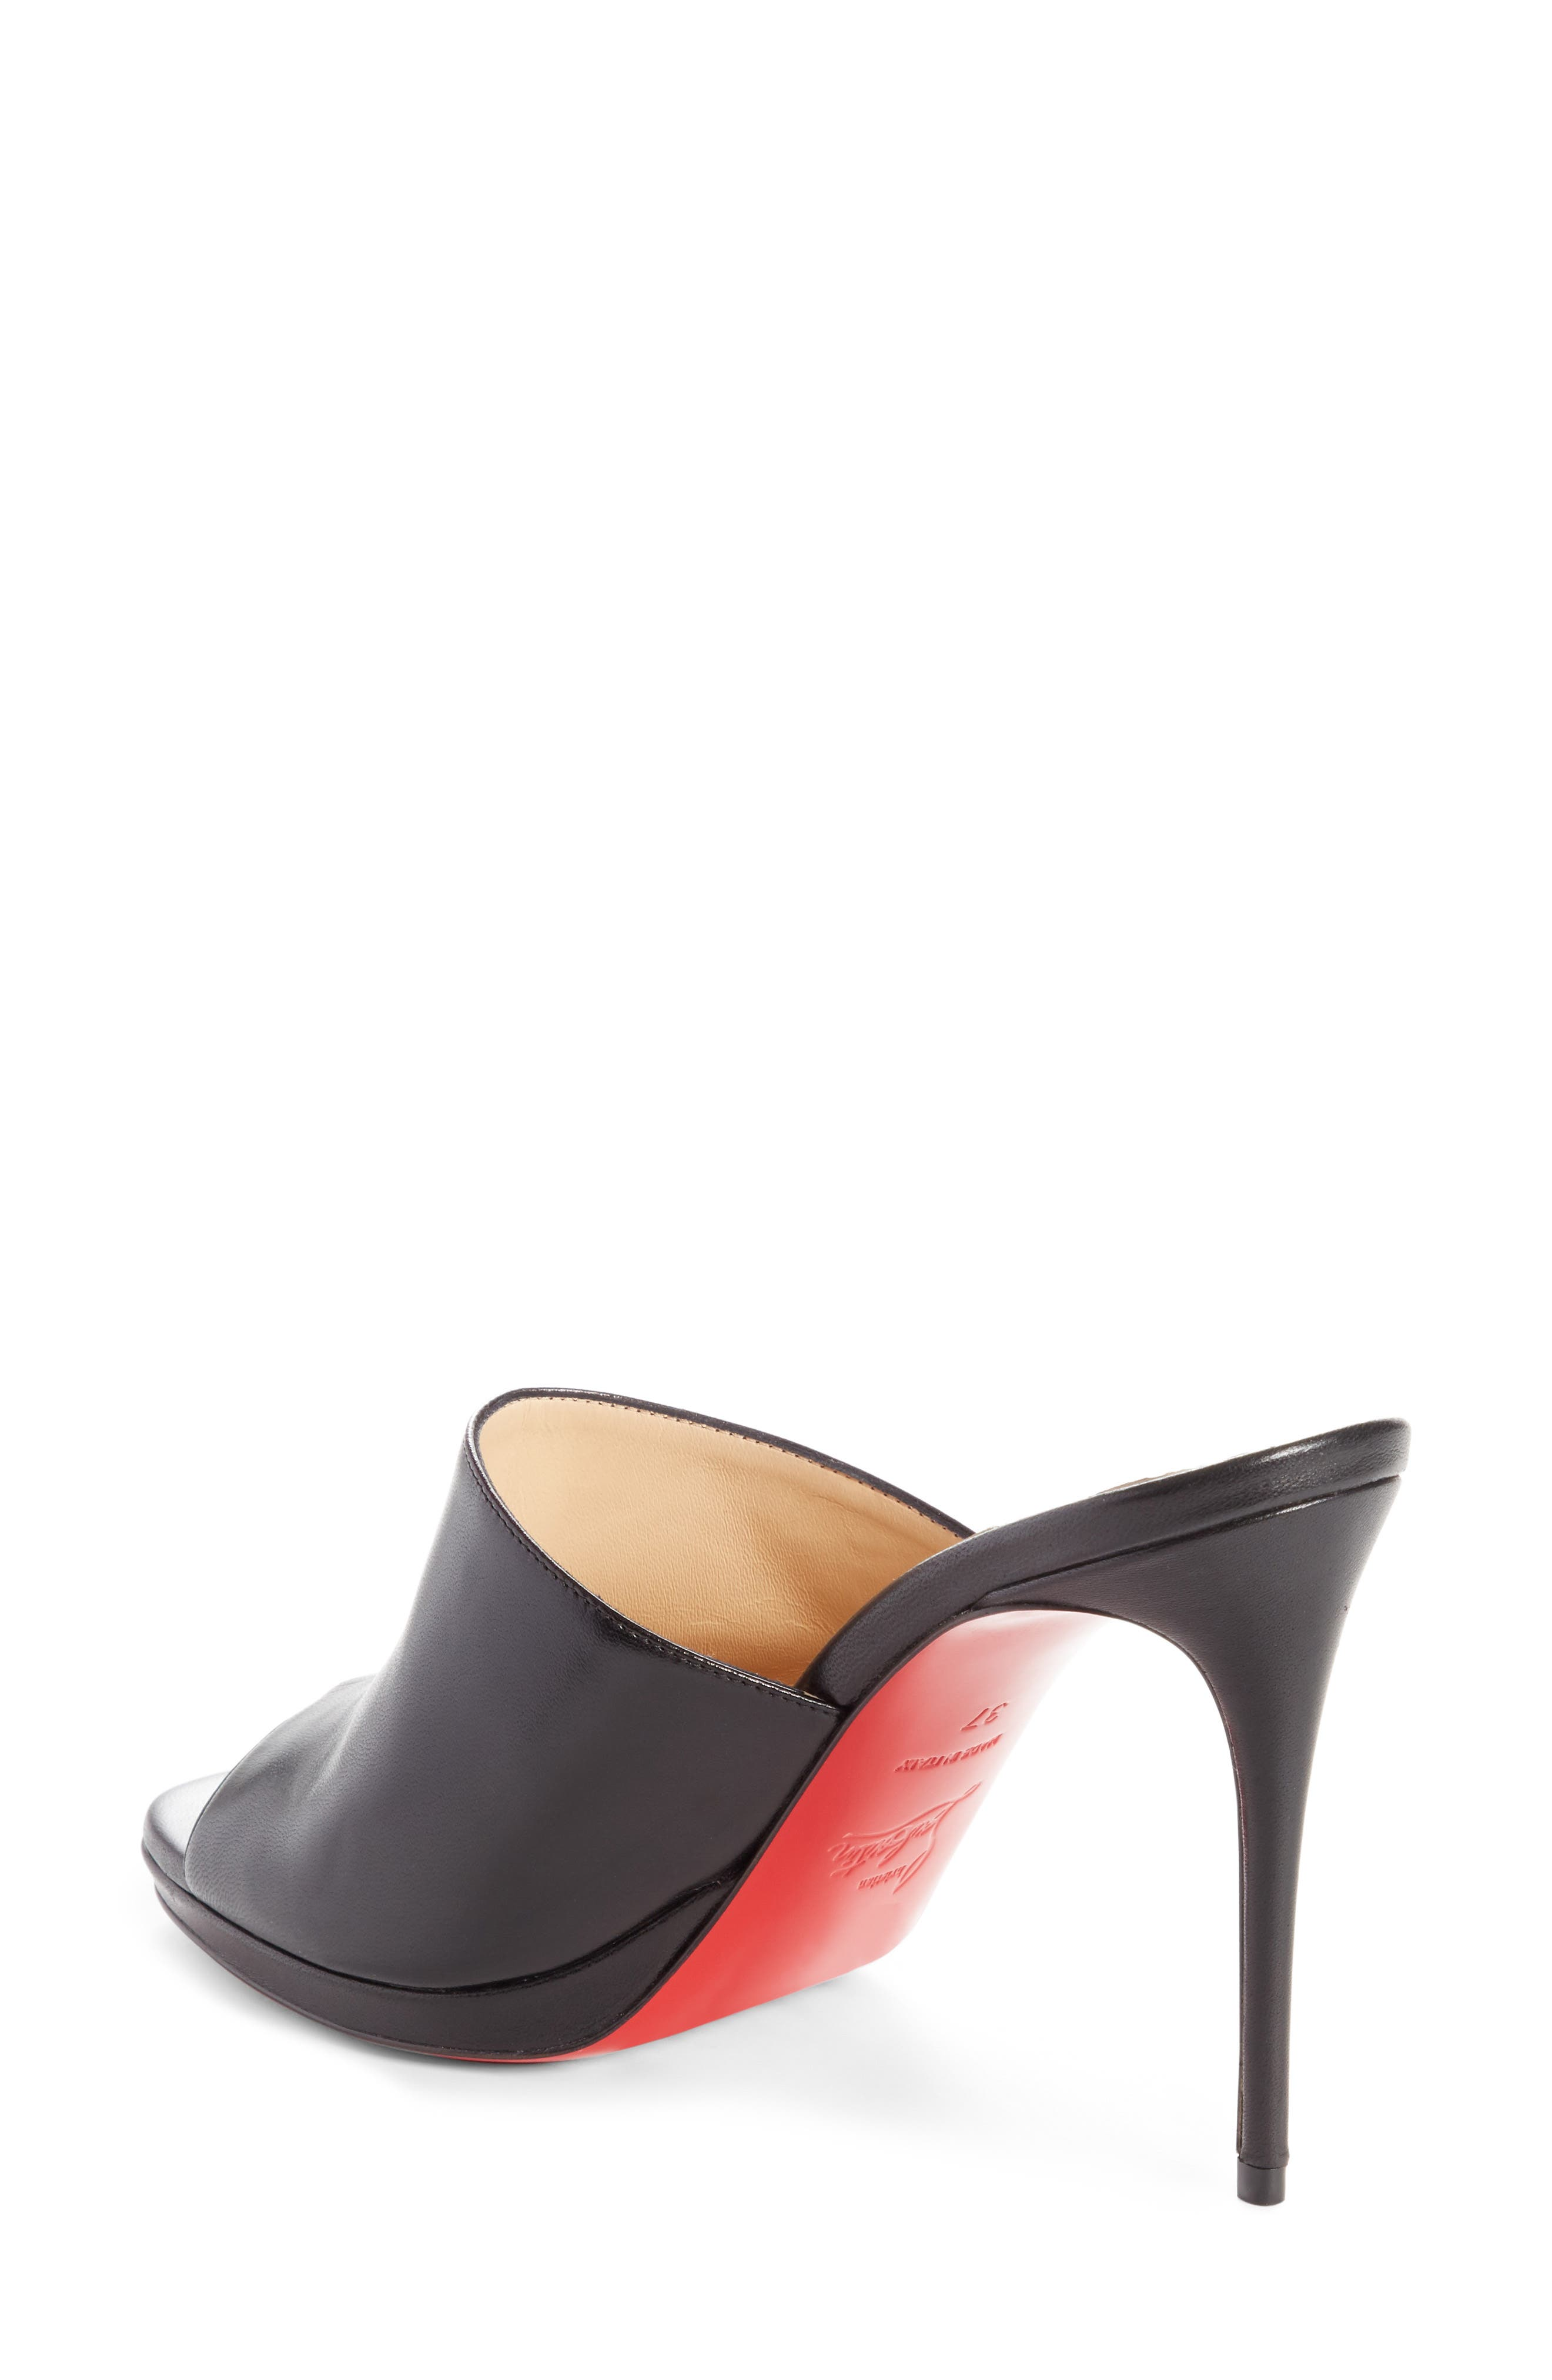 Pigamule Sandal,                             Alternate thumbnail 2, color,                             BLACK